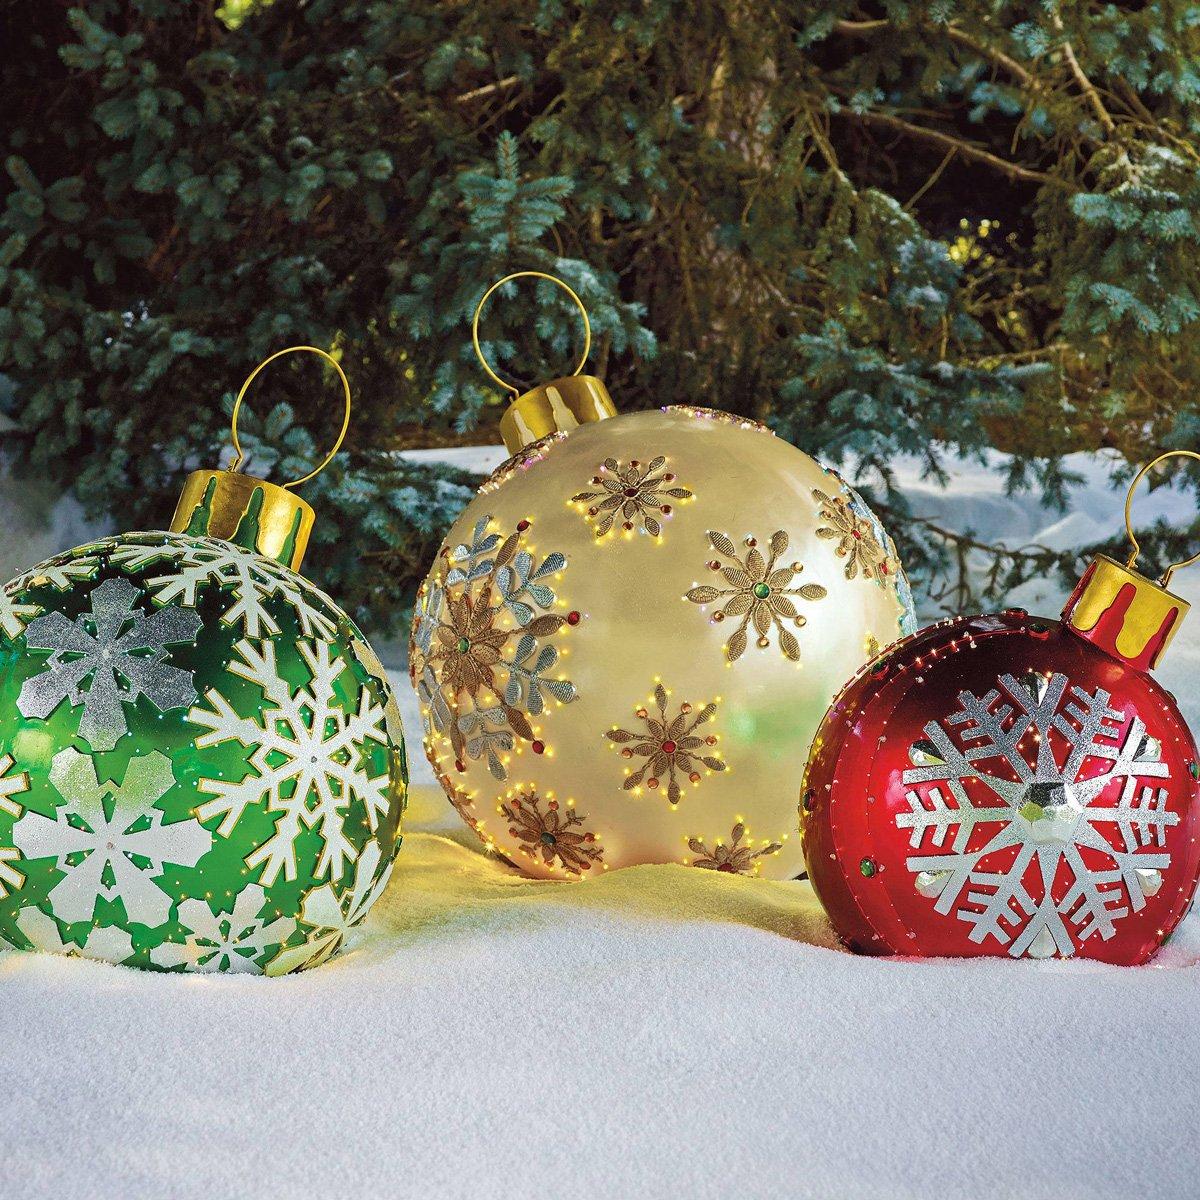 Aweinspiring Massive Led Outdoor Ornaments Massive Led Outdoor Ornaments Green Head Photo Ornaments 4 X 4 Photo Ornaments To Make By Kids photos Photo Christmas Ornaments